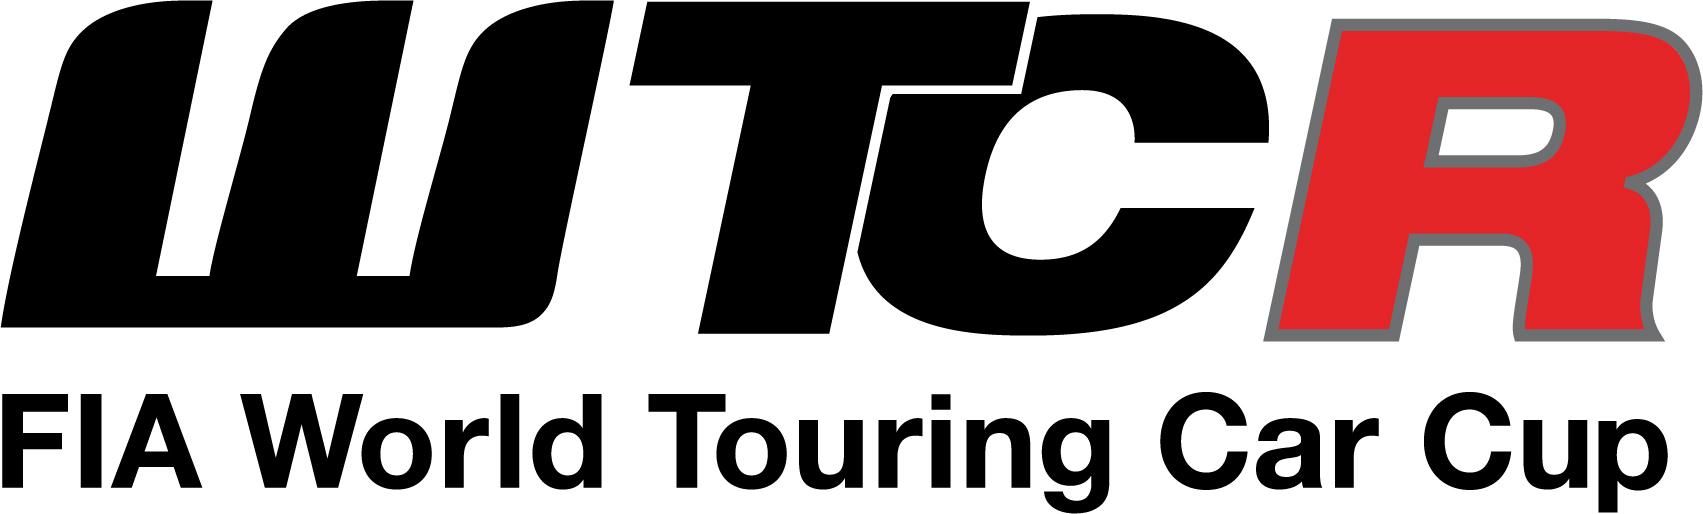 wtcr_logo-jpg.jpg